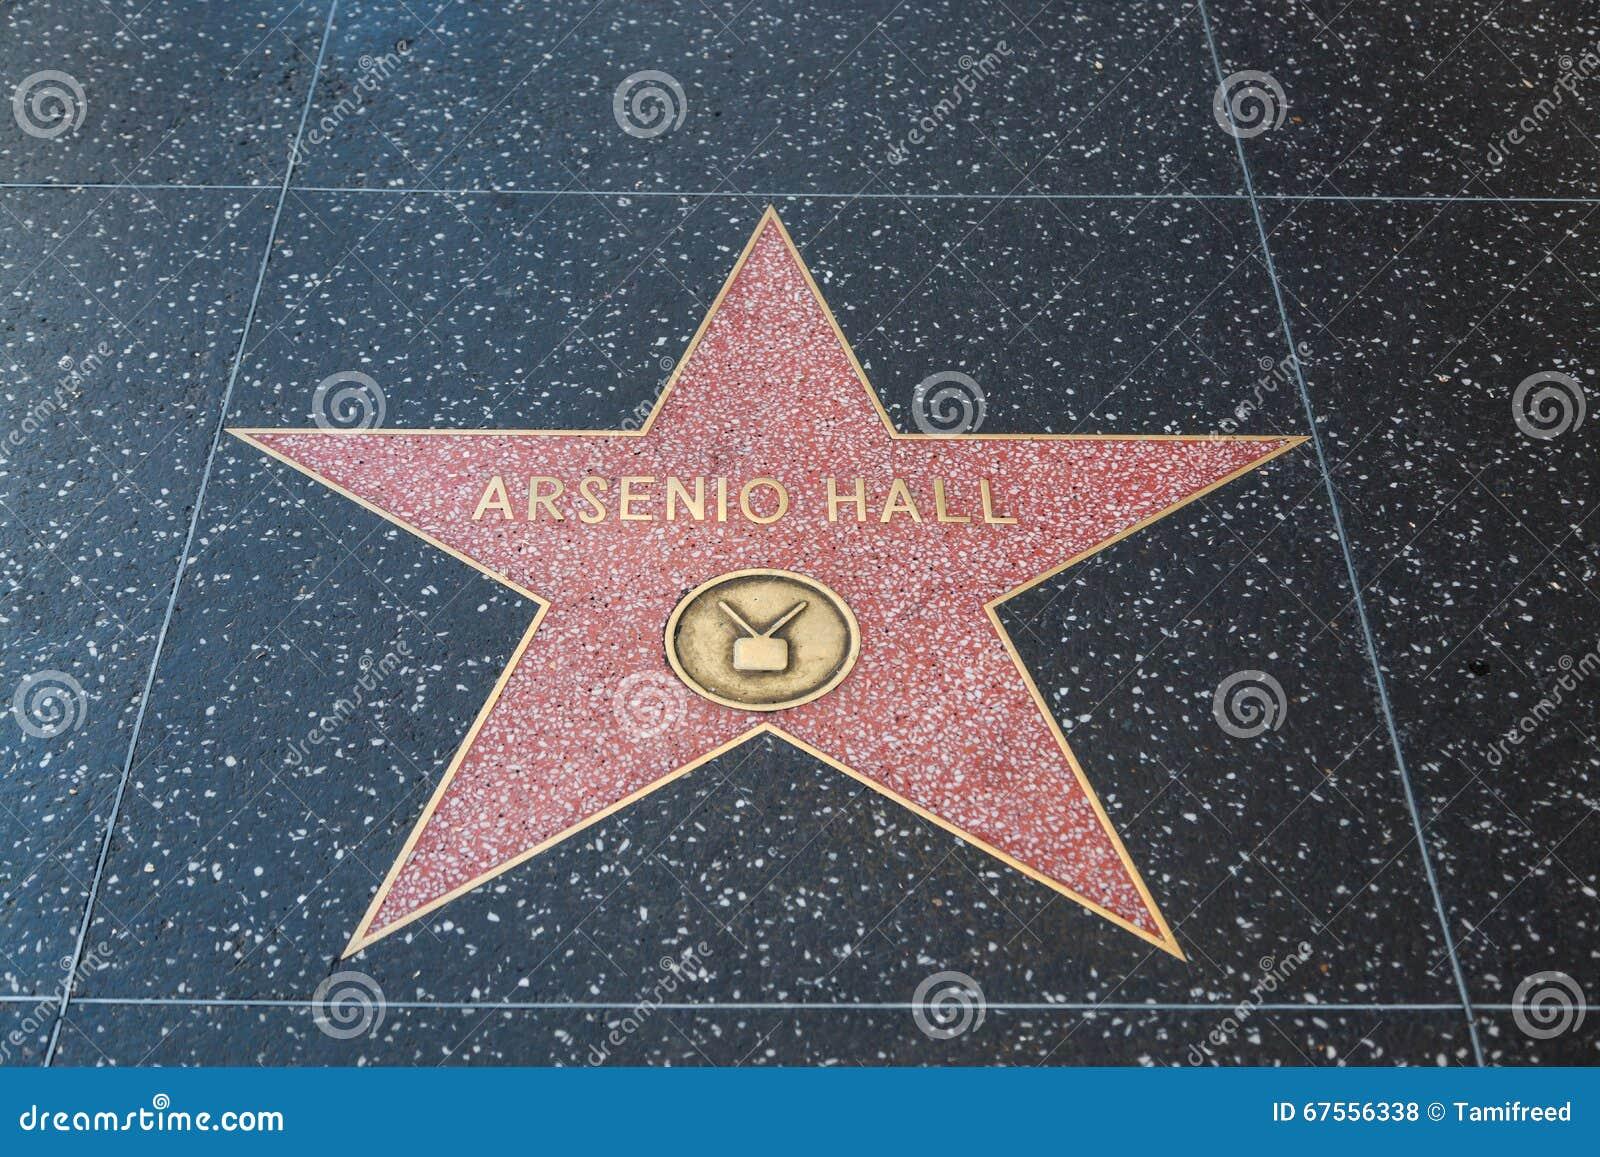 Arsenio Hall Hollywood Star